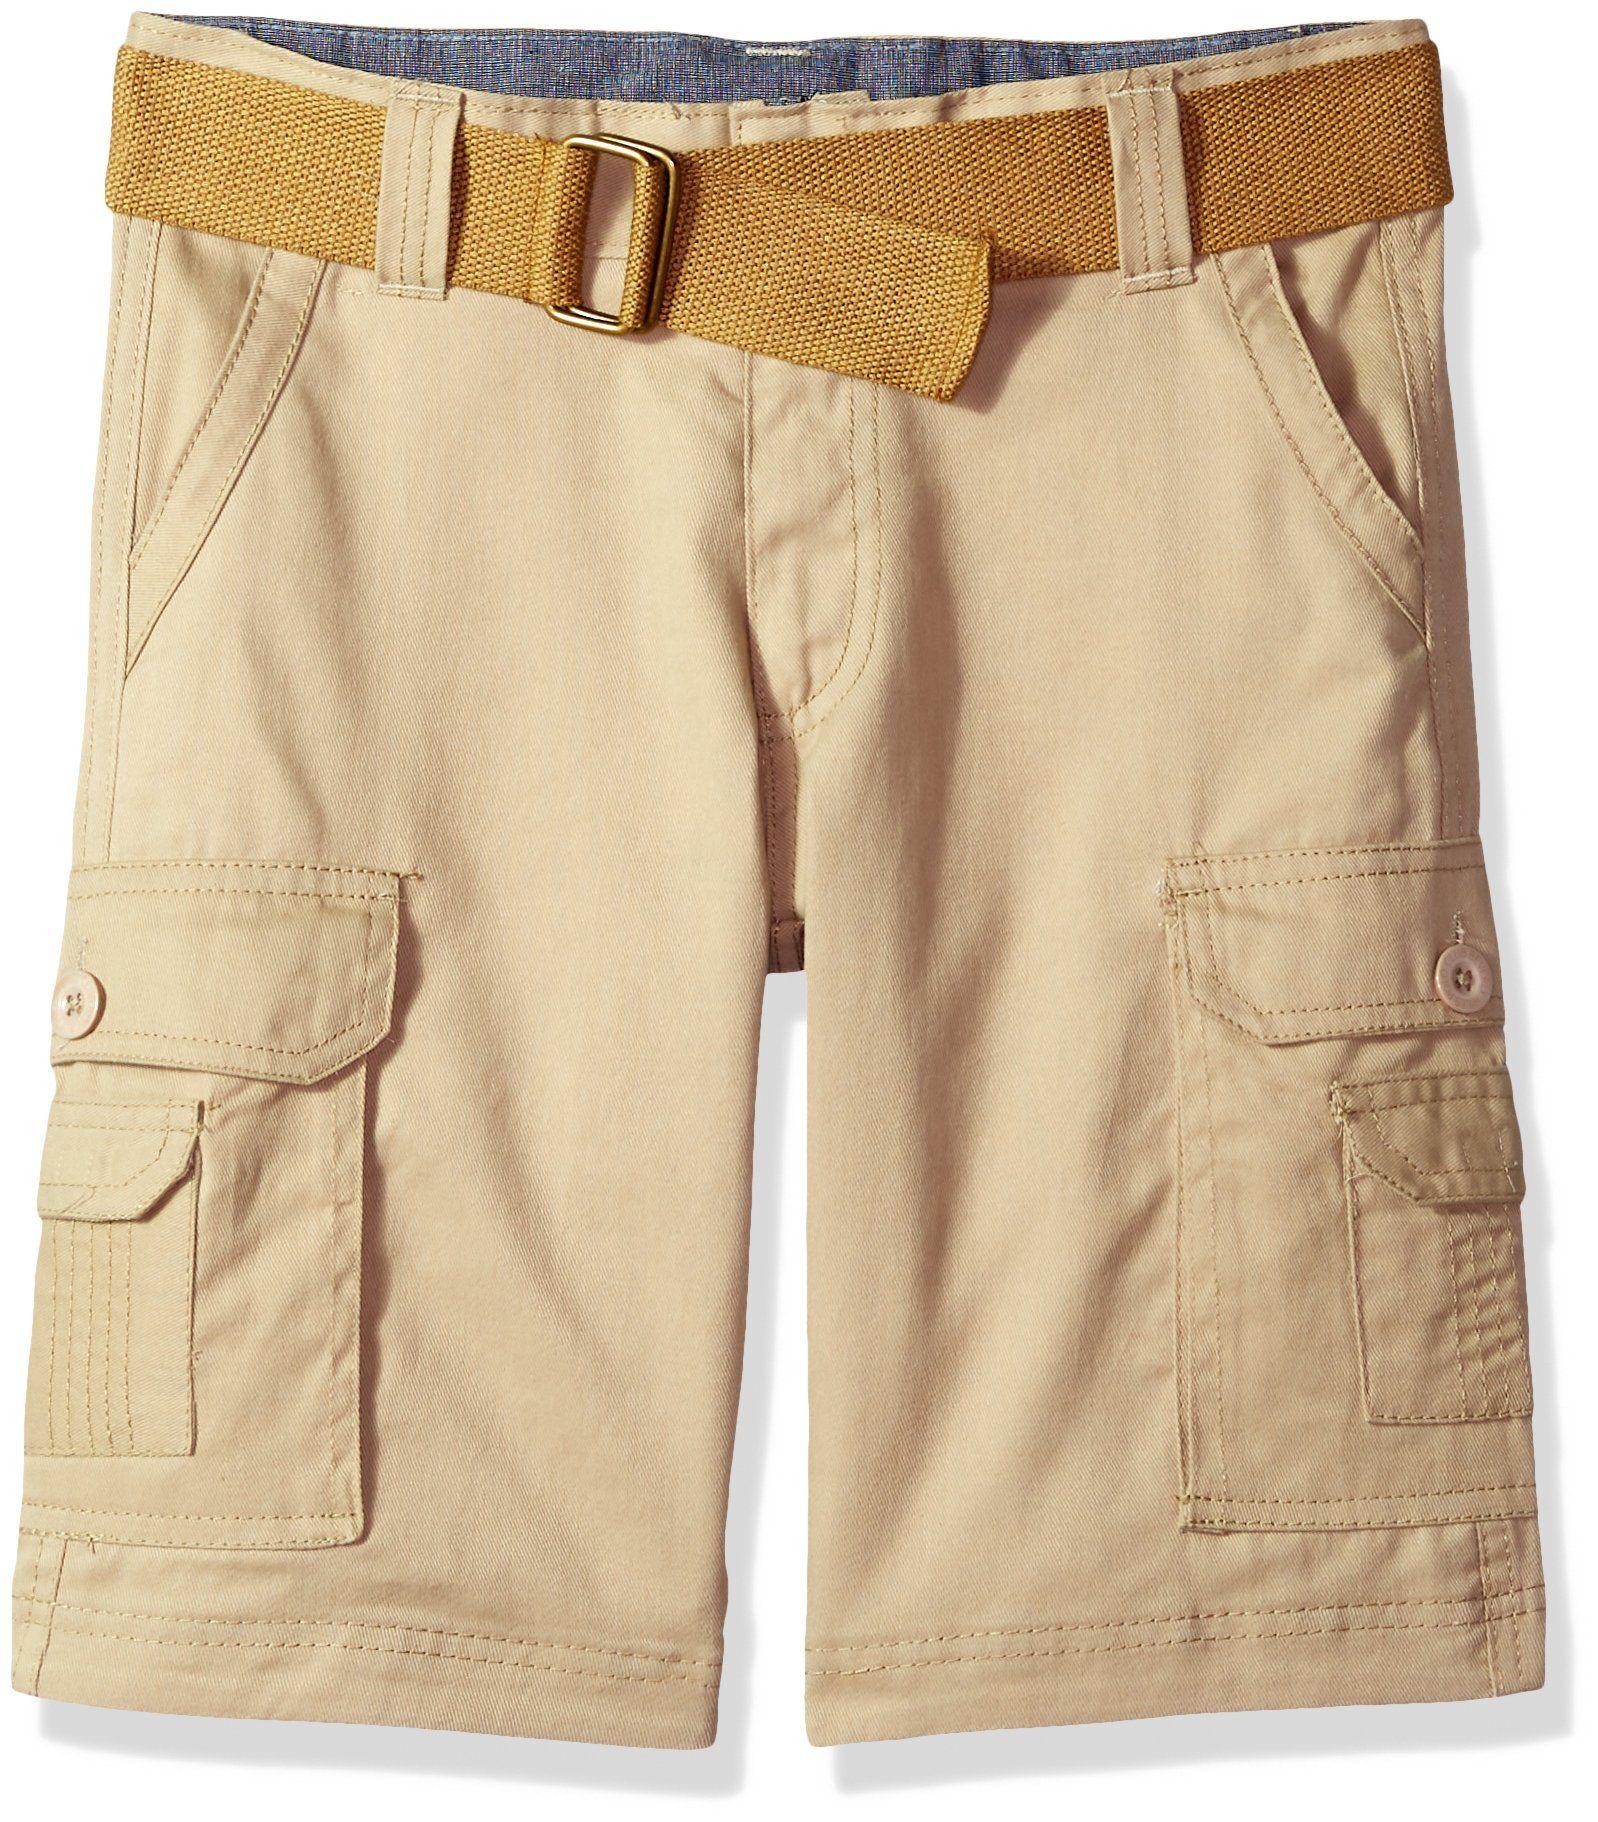 OshKosh BGosh Boys Woven Short 31771812 Brown 5 Kids